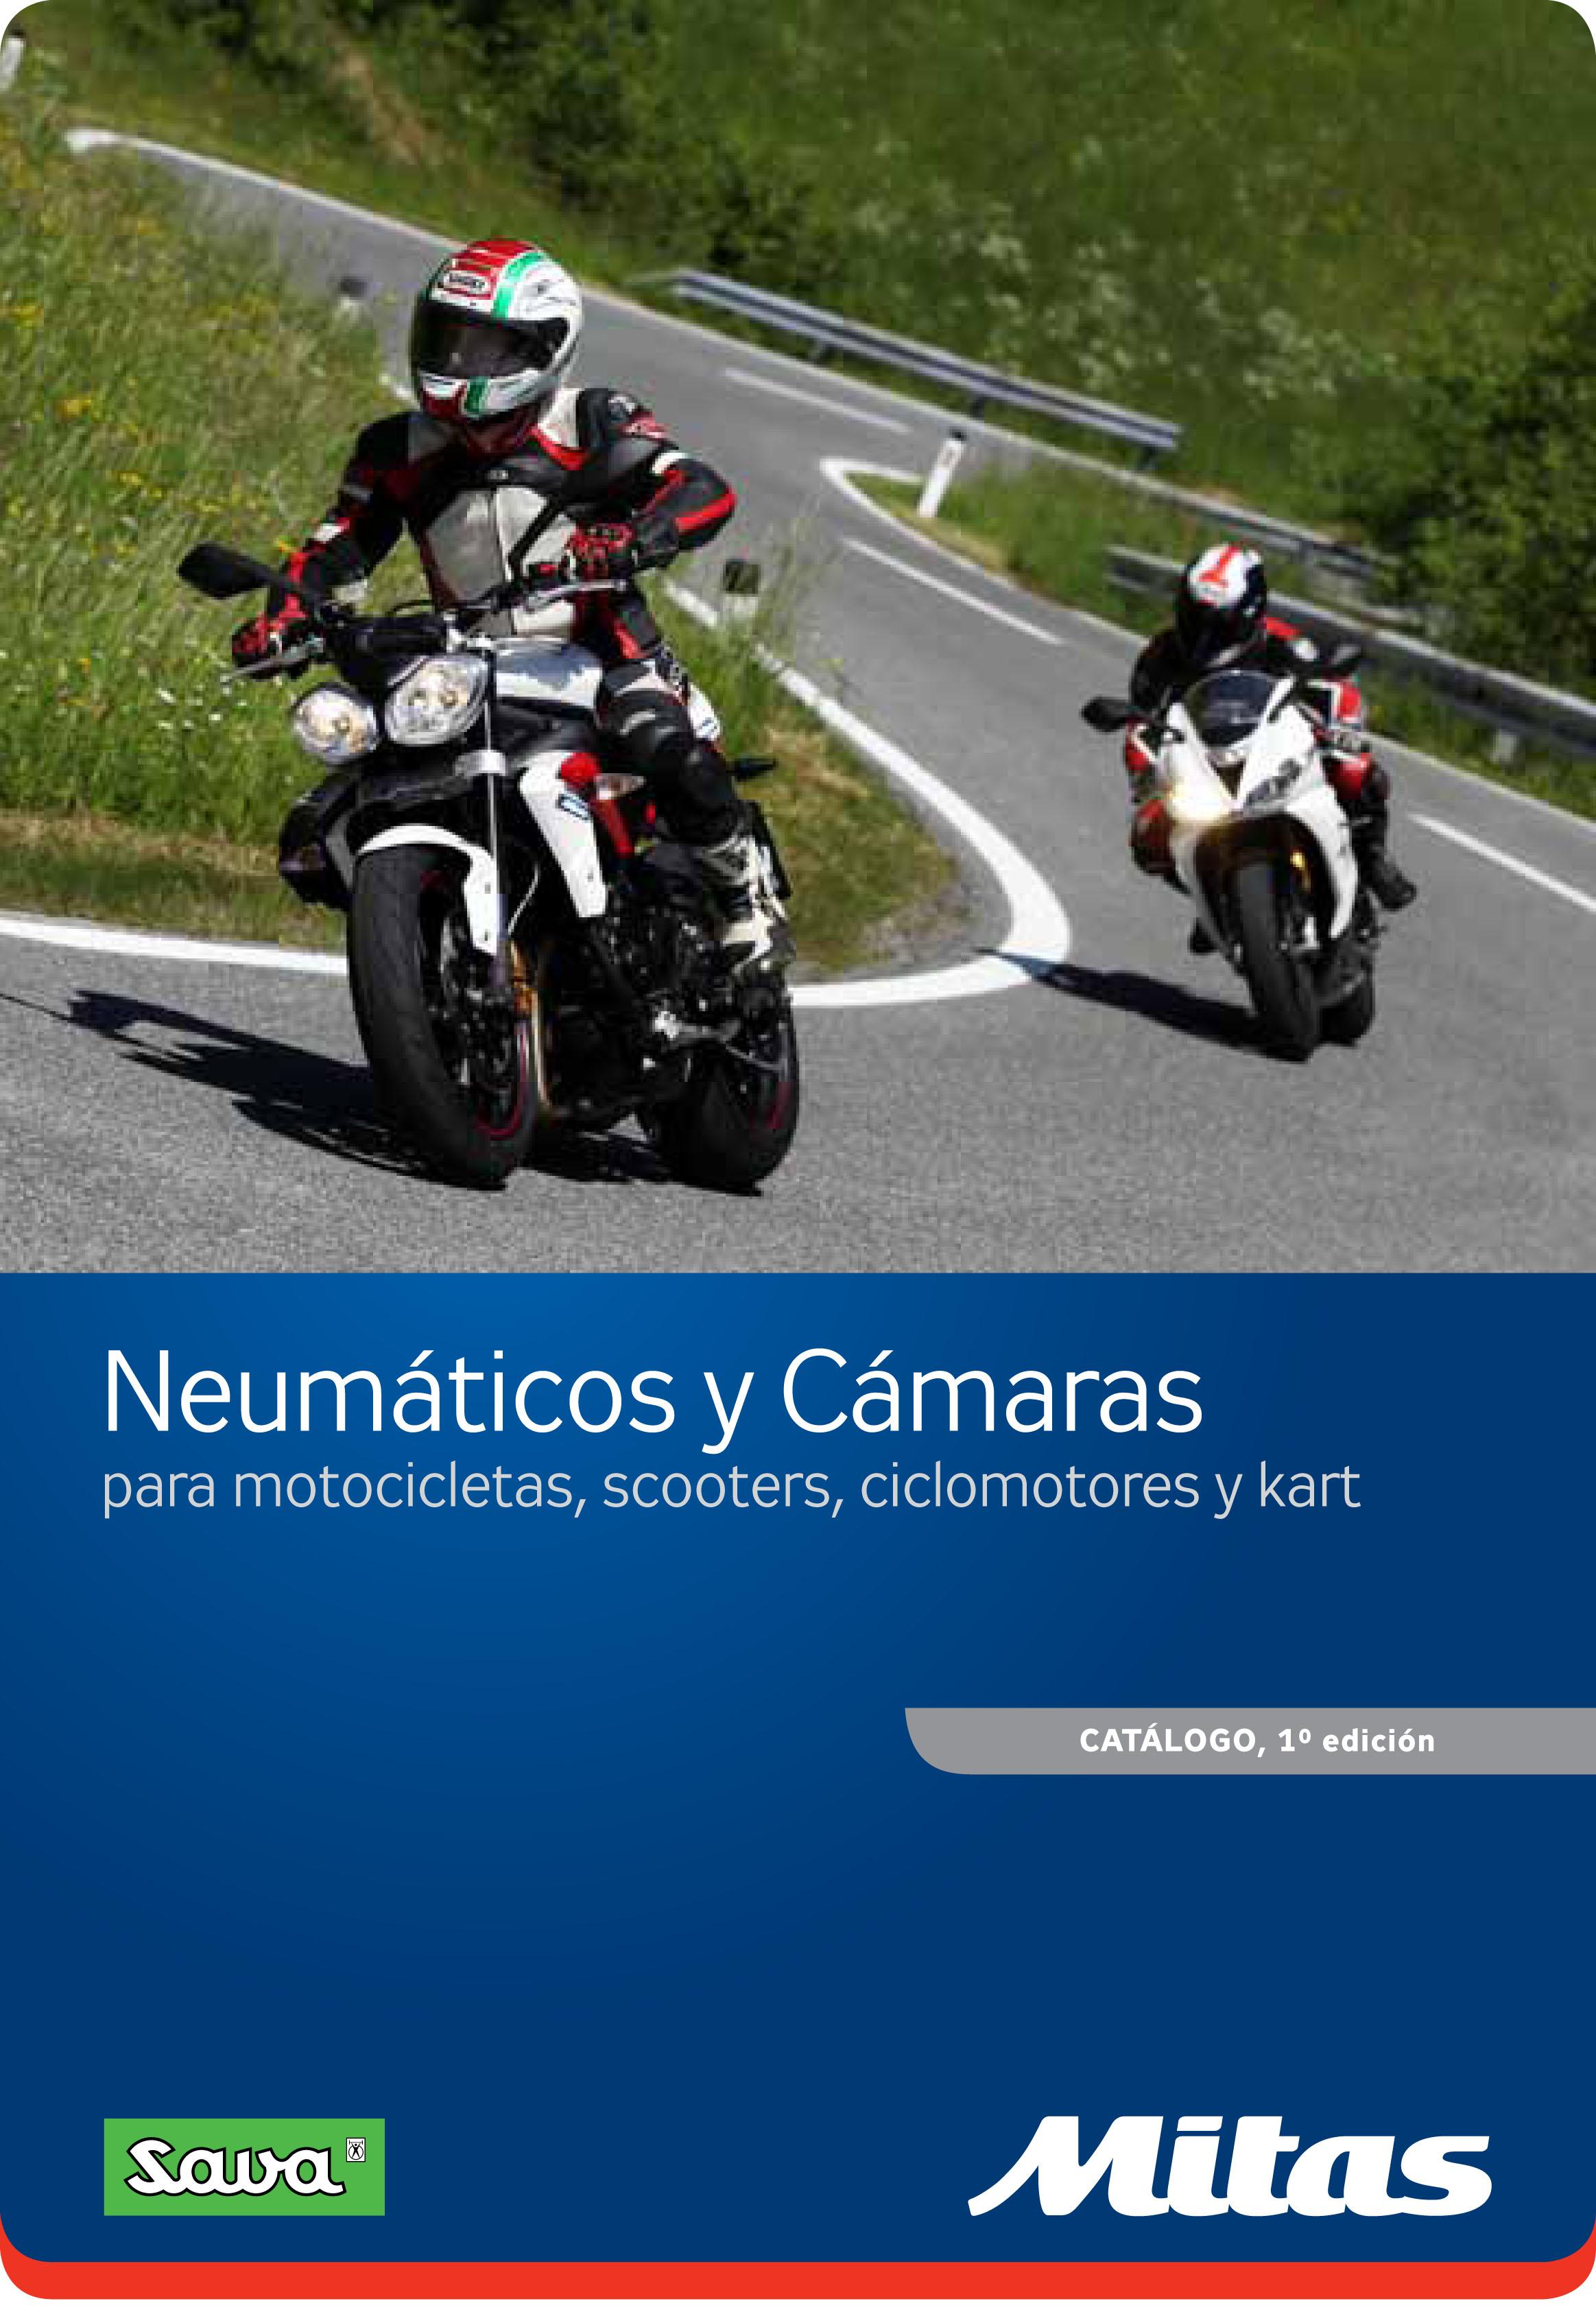 Catalogo informacion Mitas Neumoto Neumaticos Valencia